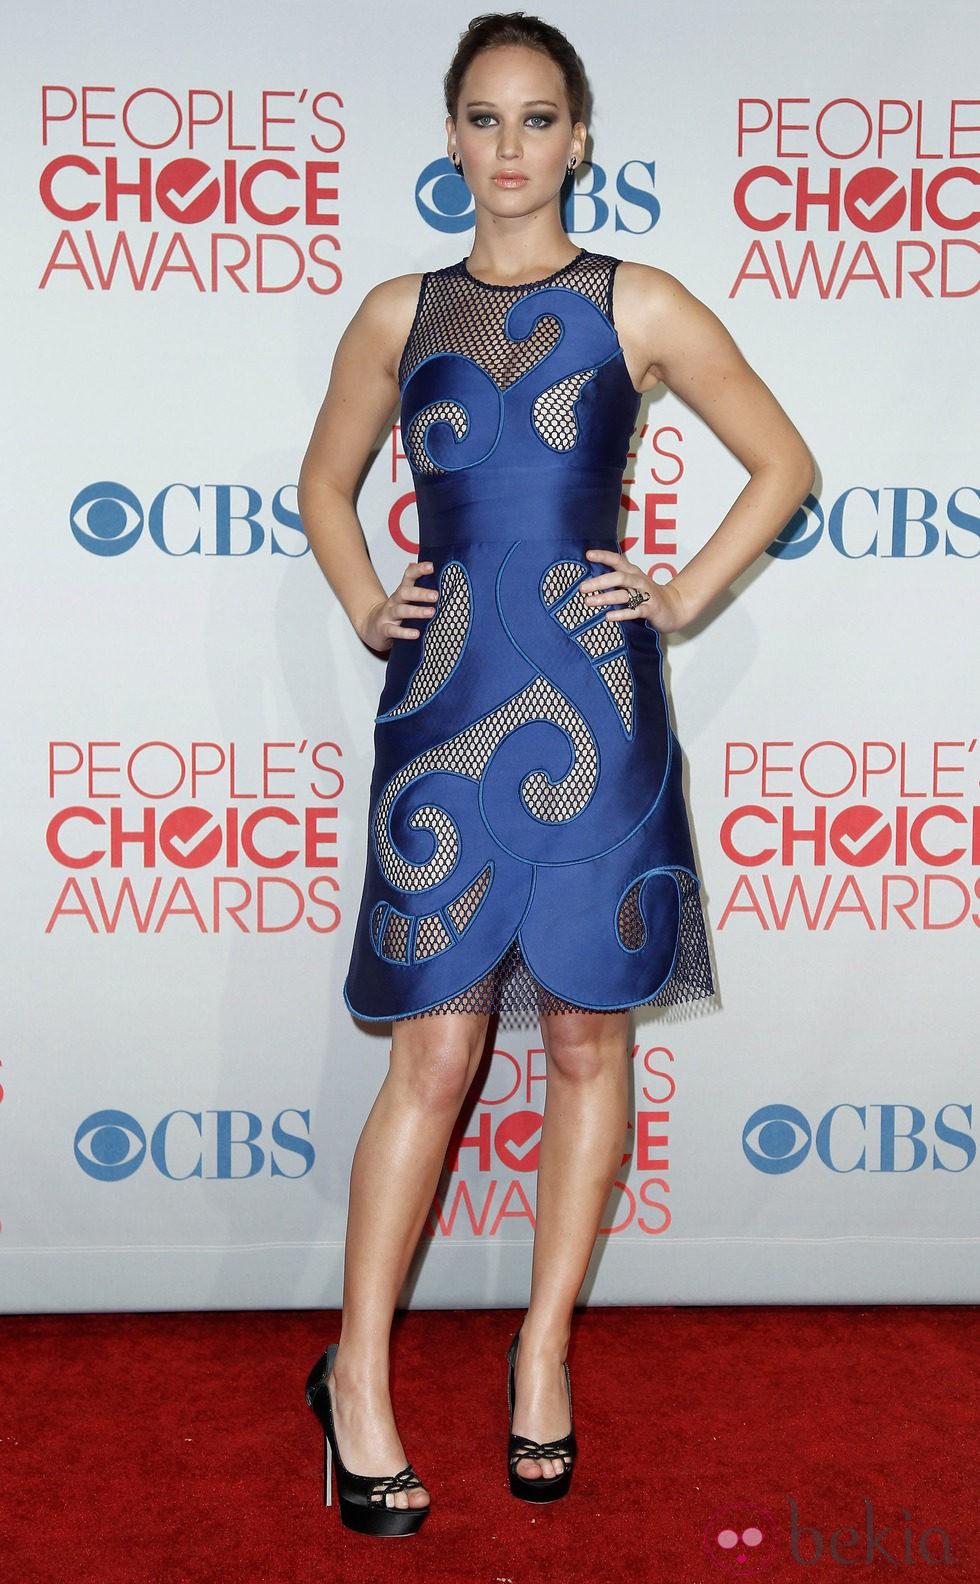 Jennifer Lawrence con smookey eyes en los People's Choice Awards